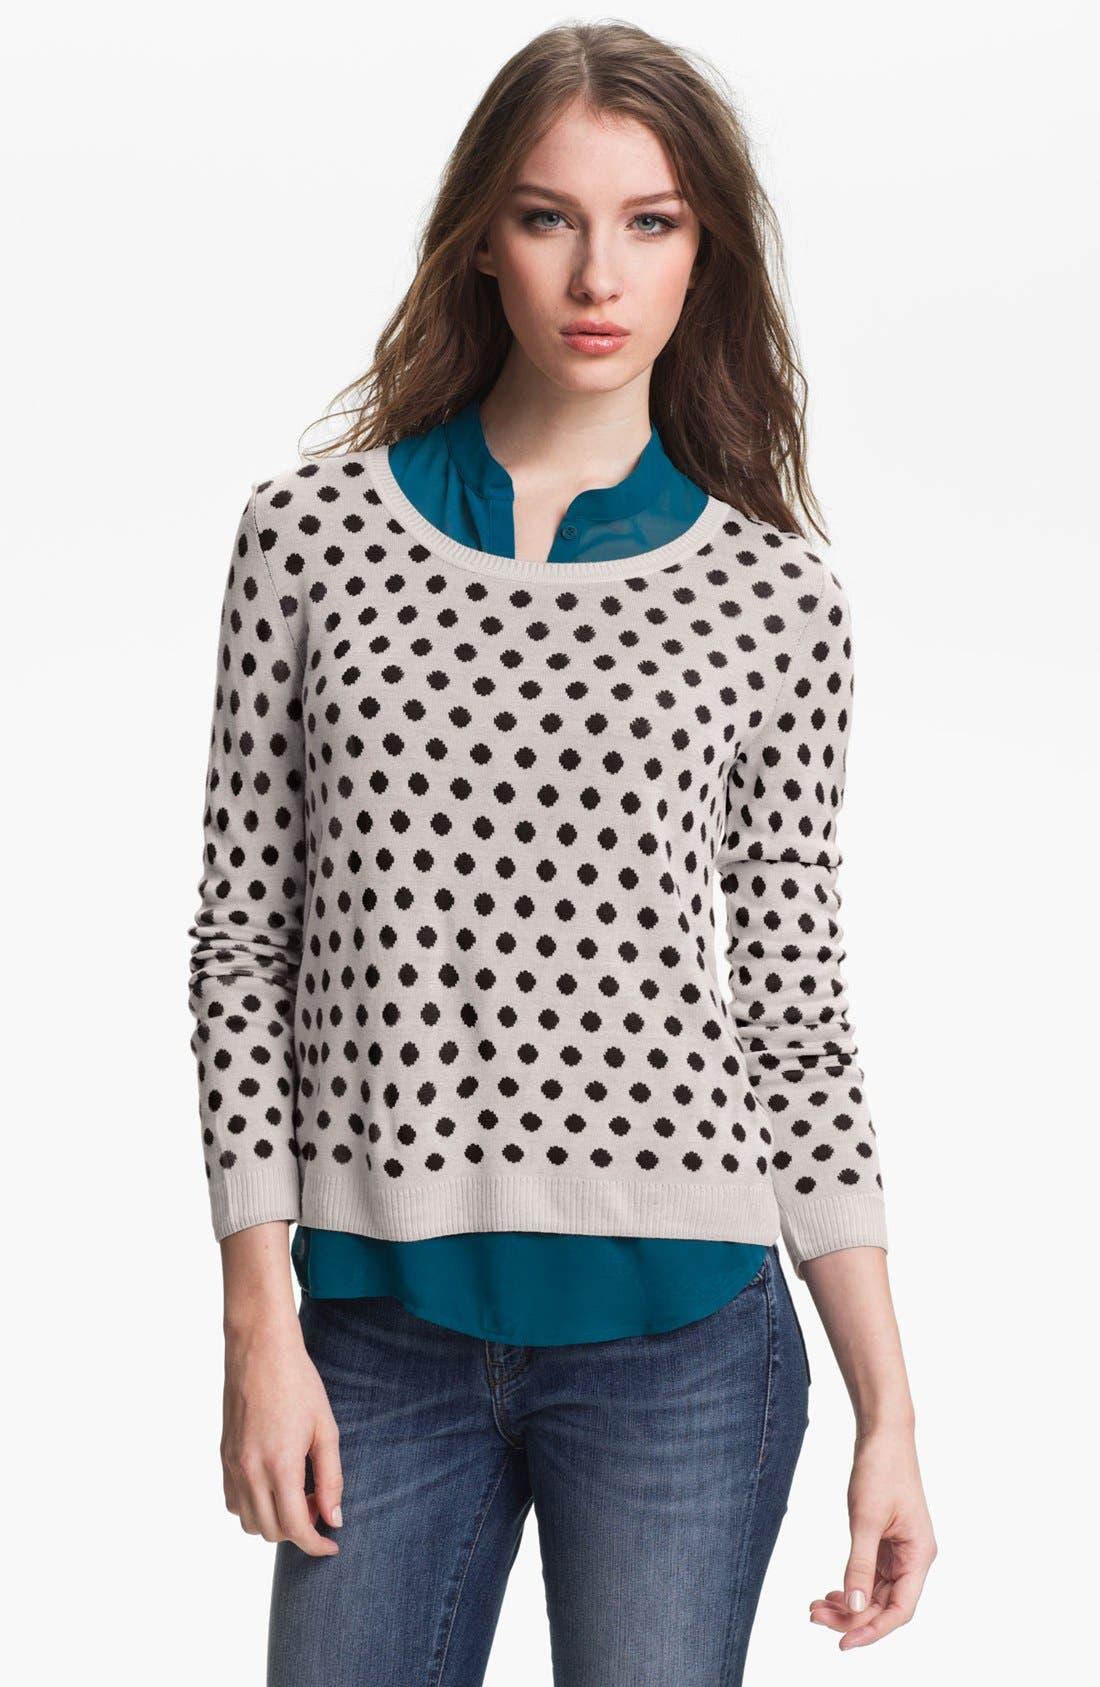 Alternate Image 1 Selected - Kensie Reversible Dot Sweater